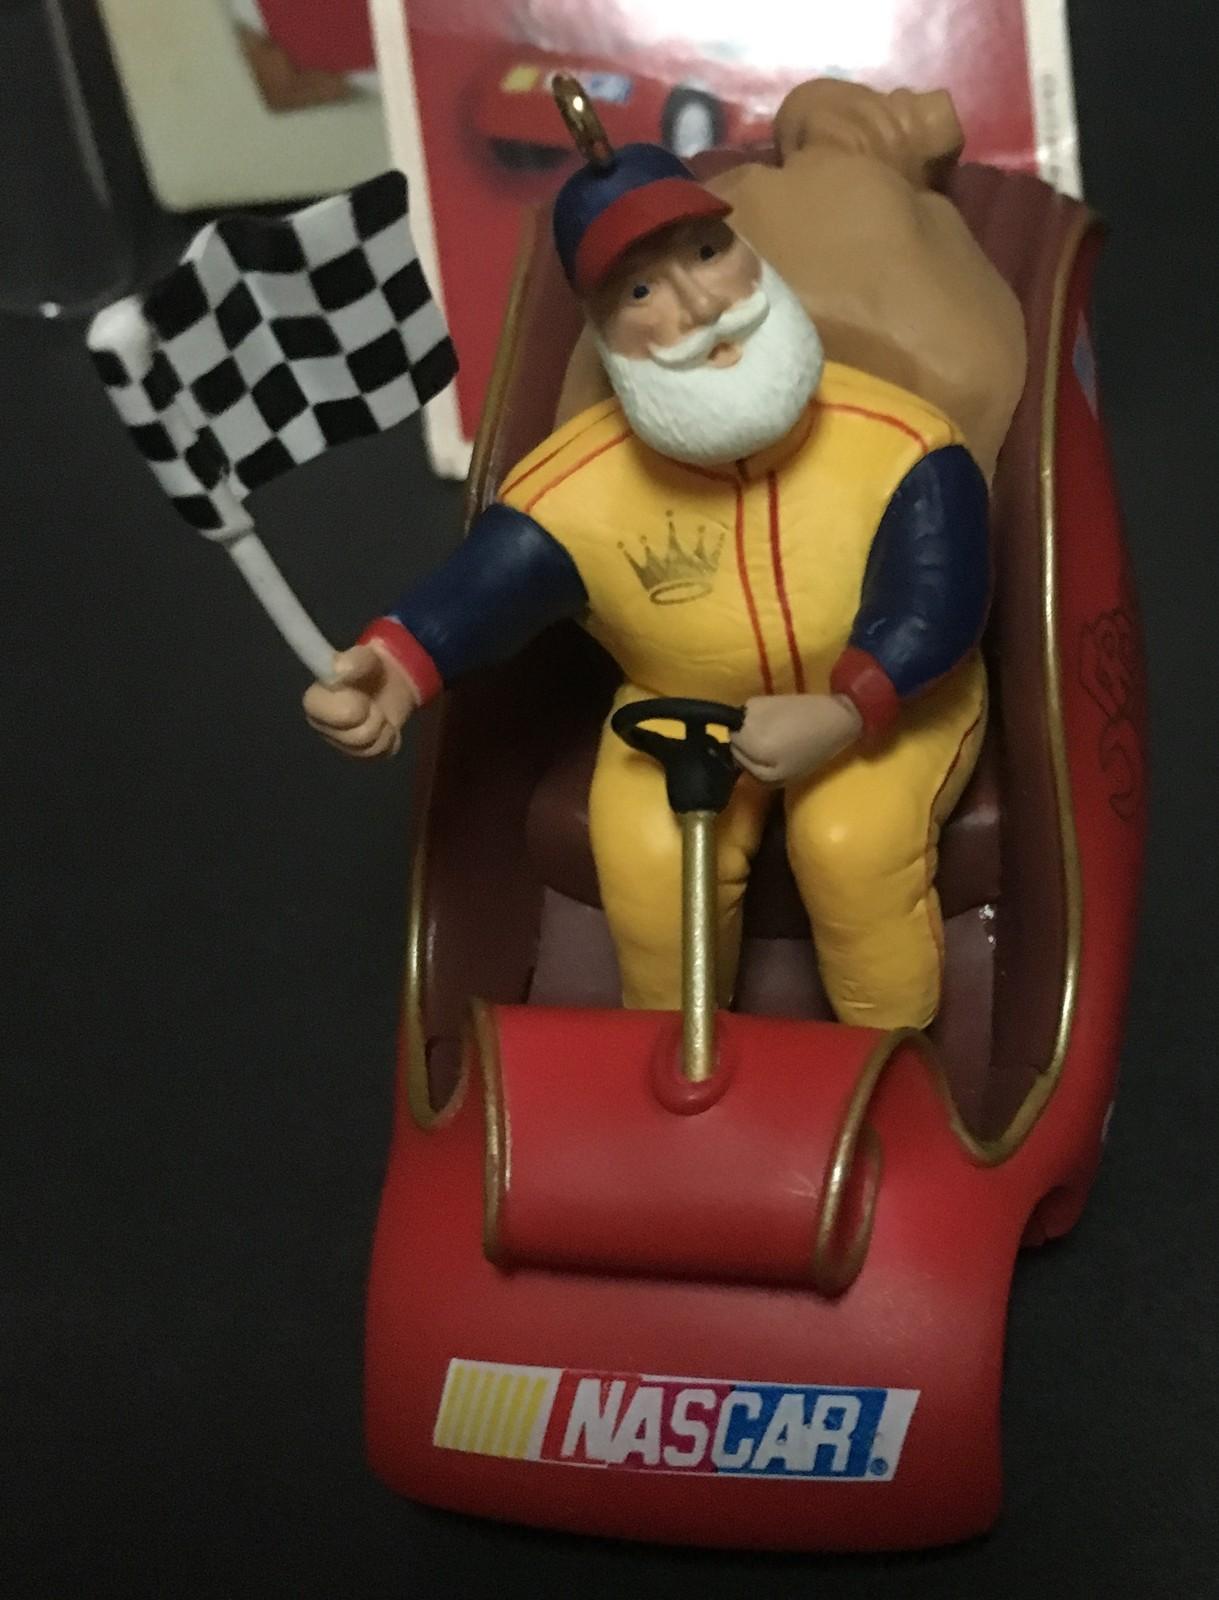 Hallmark 2002 Keepsake Ornament Nascar Santa's Racing Sleigh